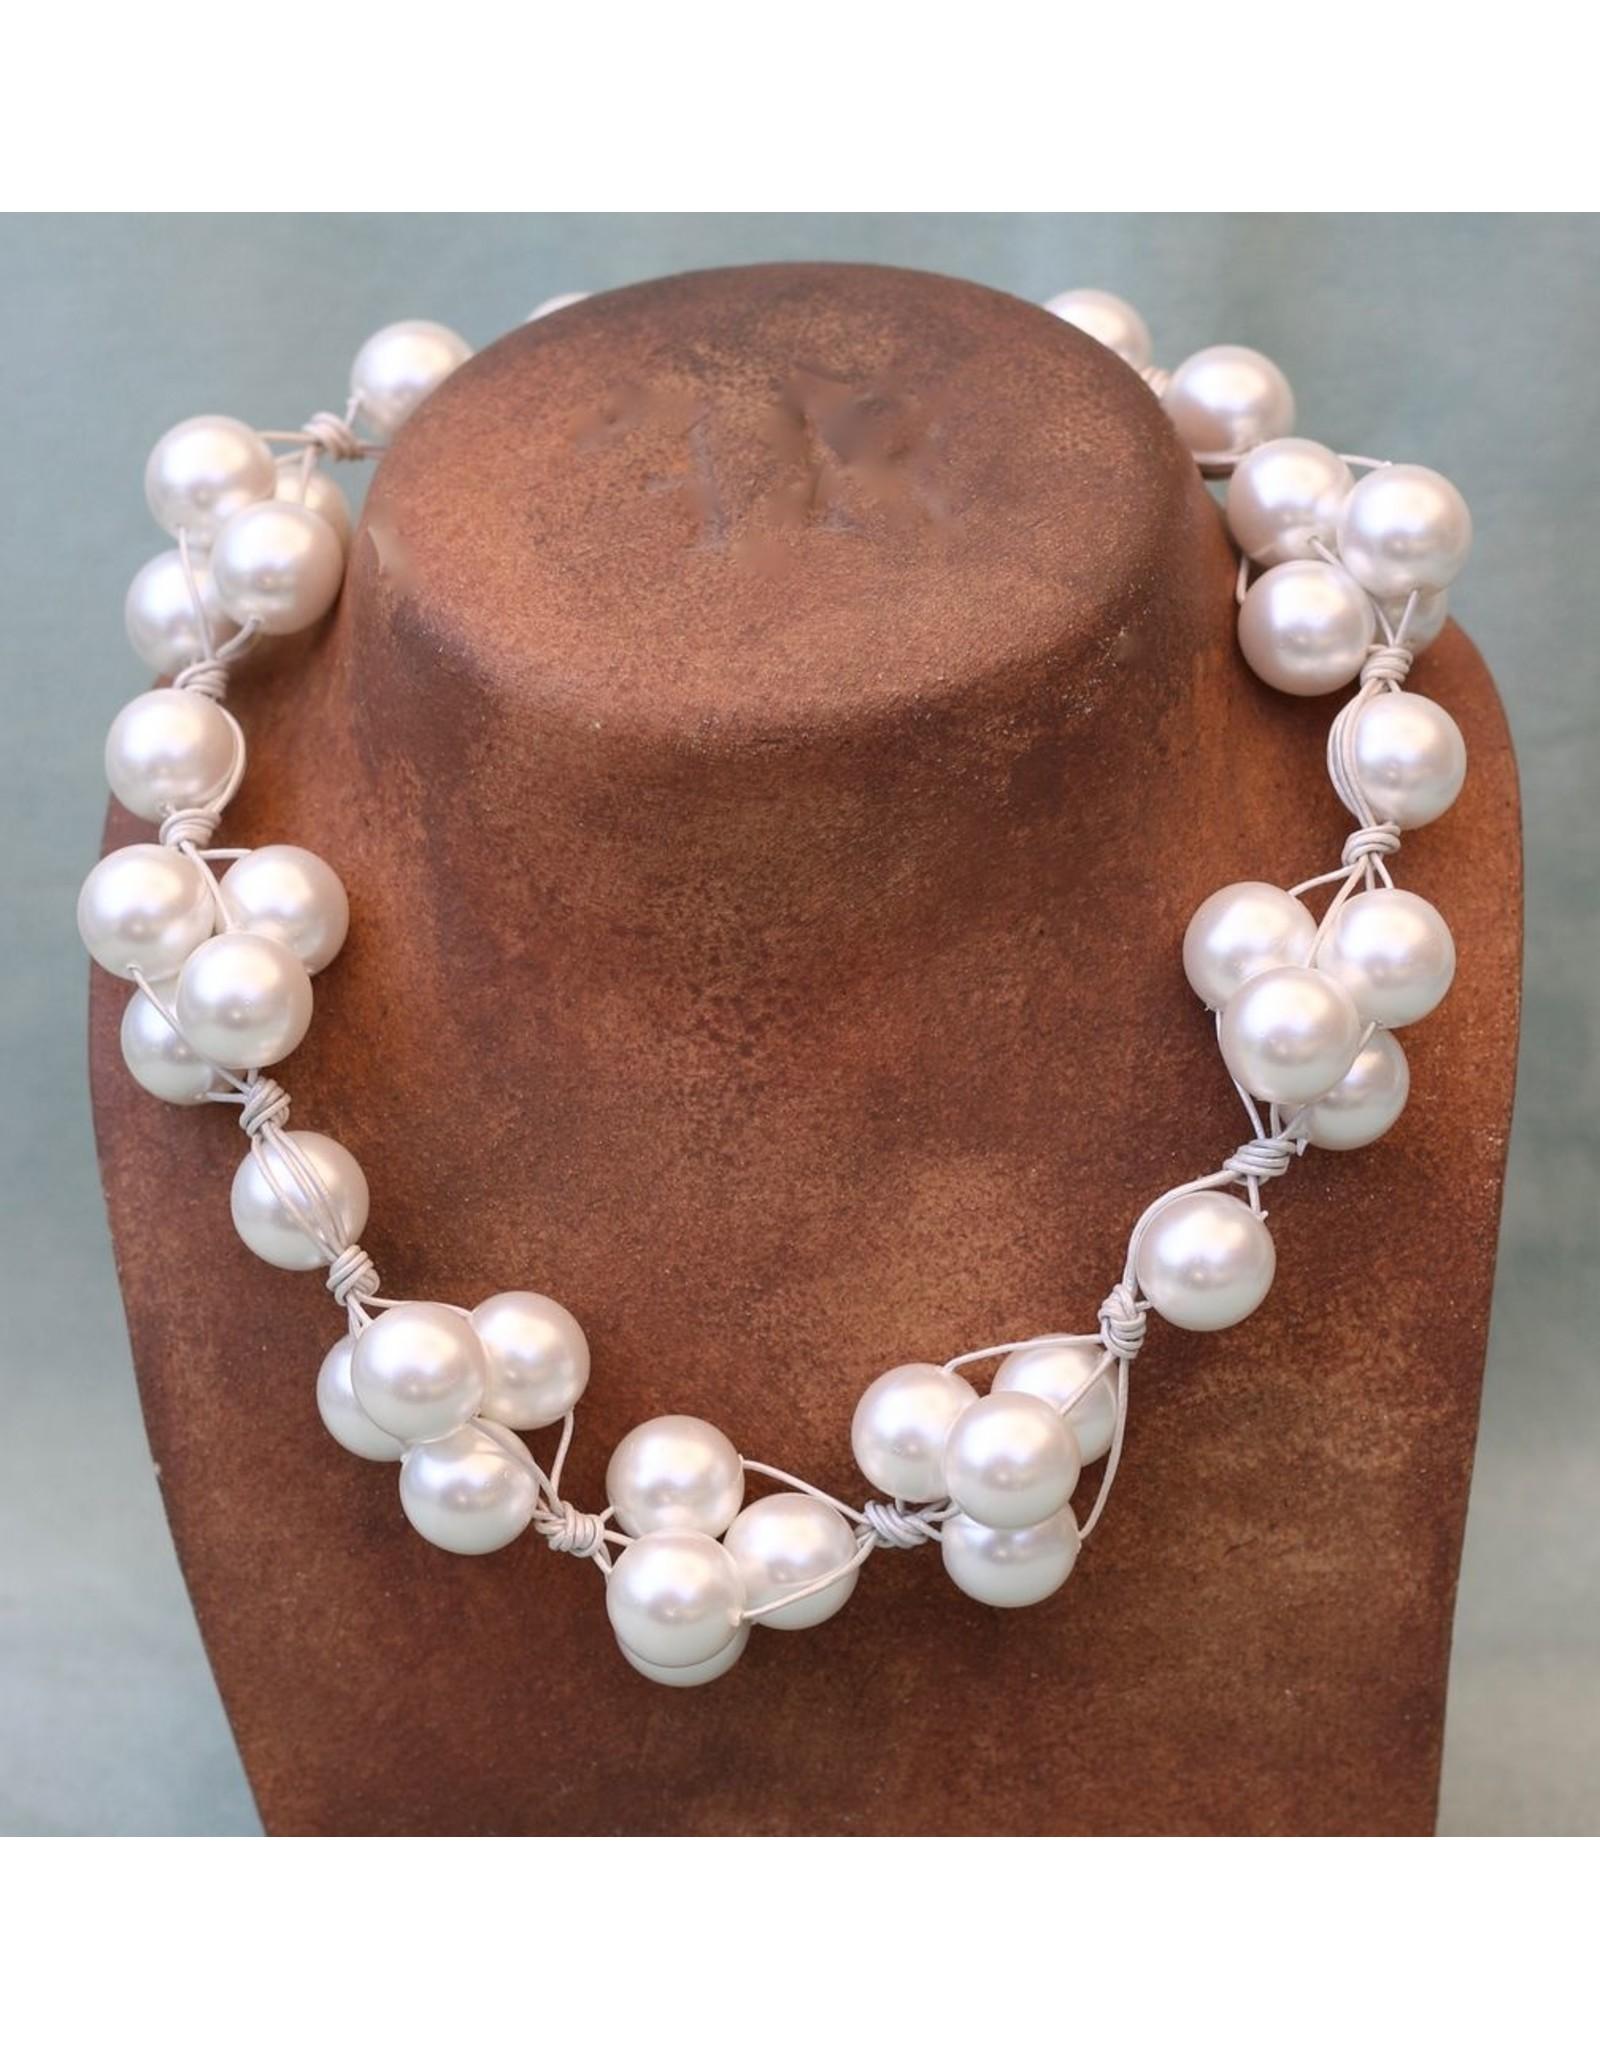 Deborah Grivas Design VCExclusives: White Pearl on White Cord